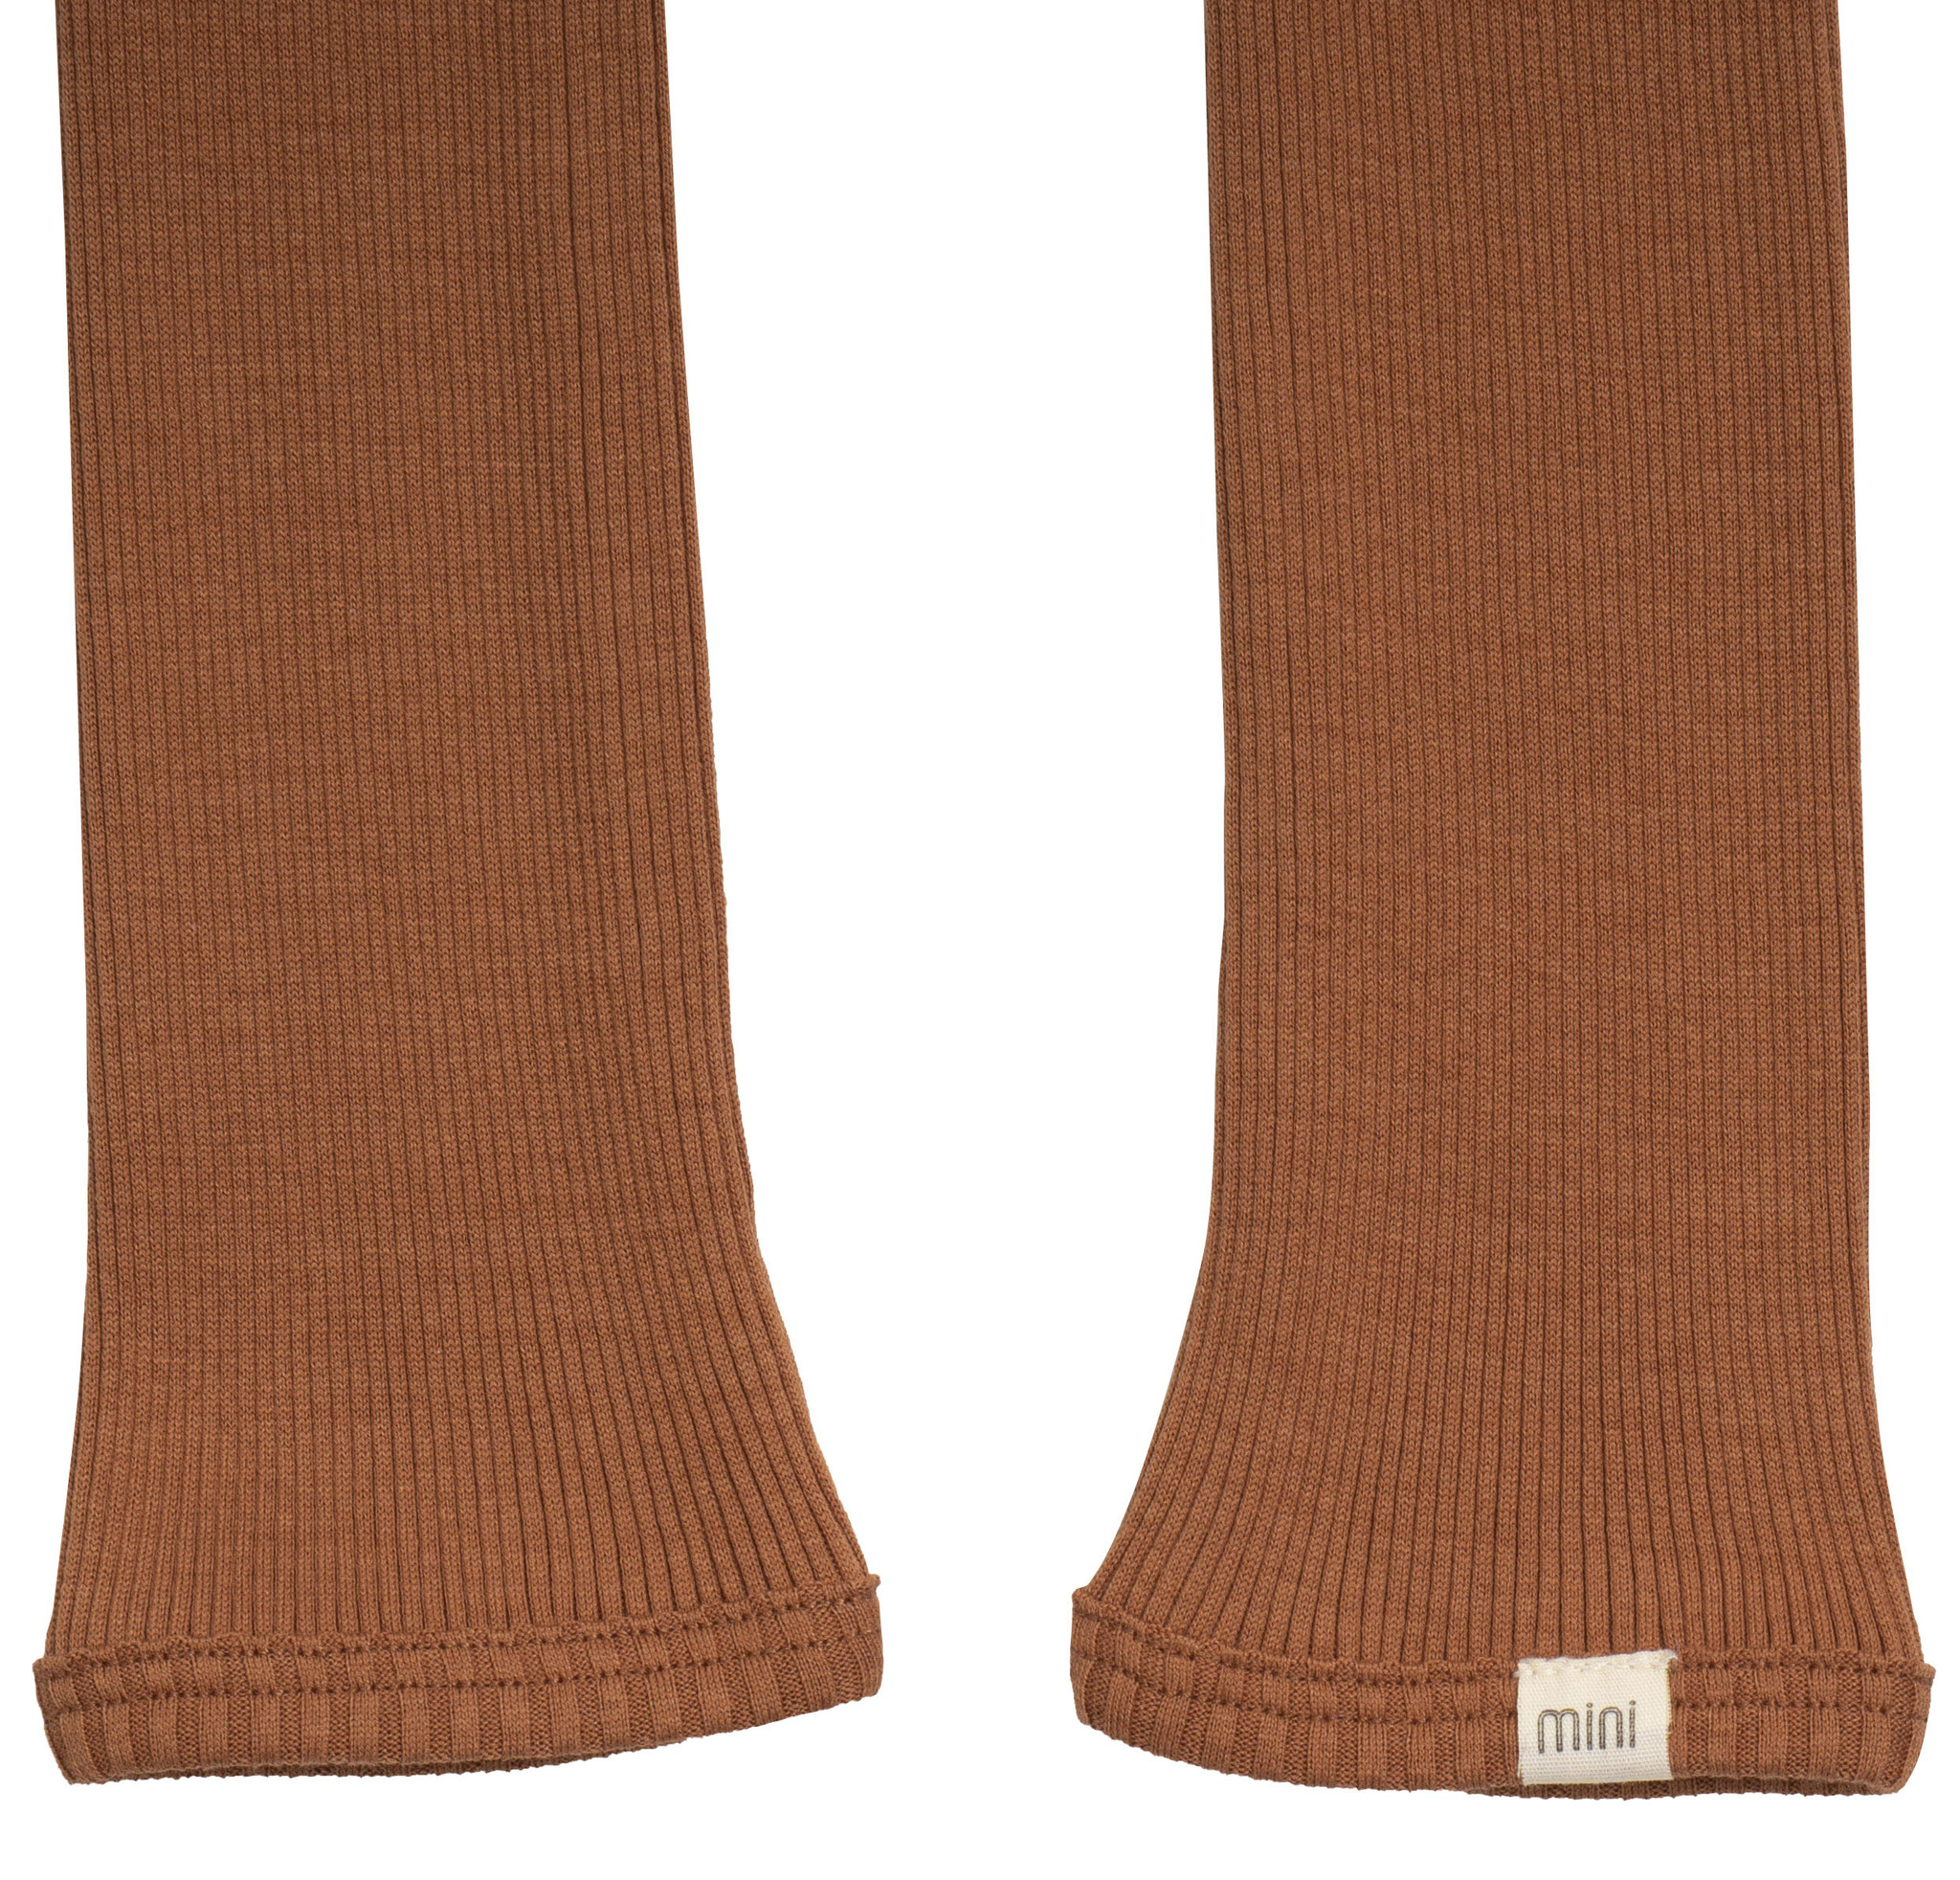 Minimalisma BIEBER silk leggings  - fine rib - 70% silk - rooibos - 1m to 14 years